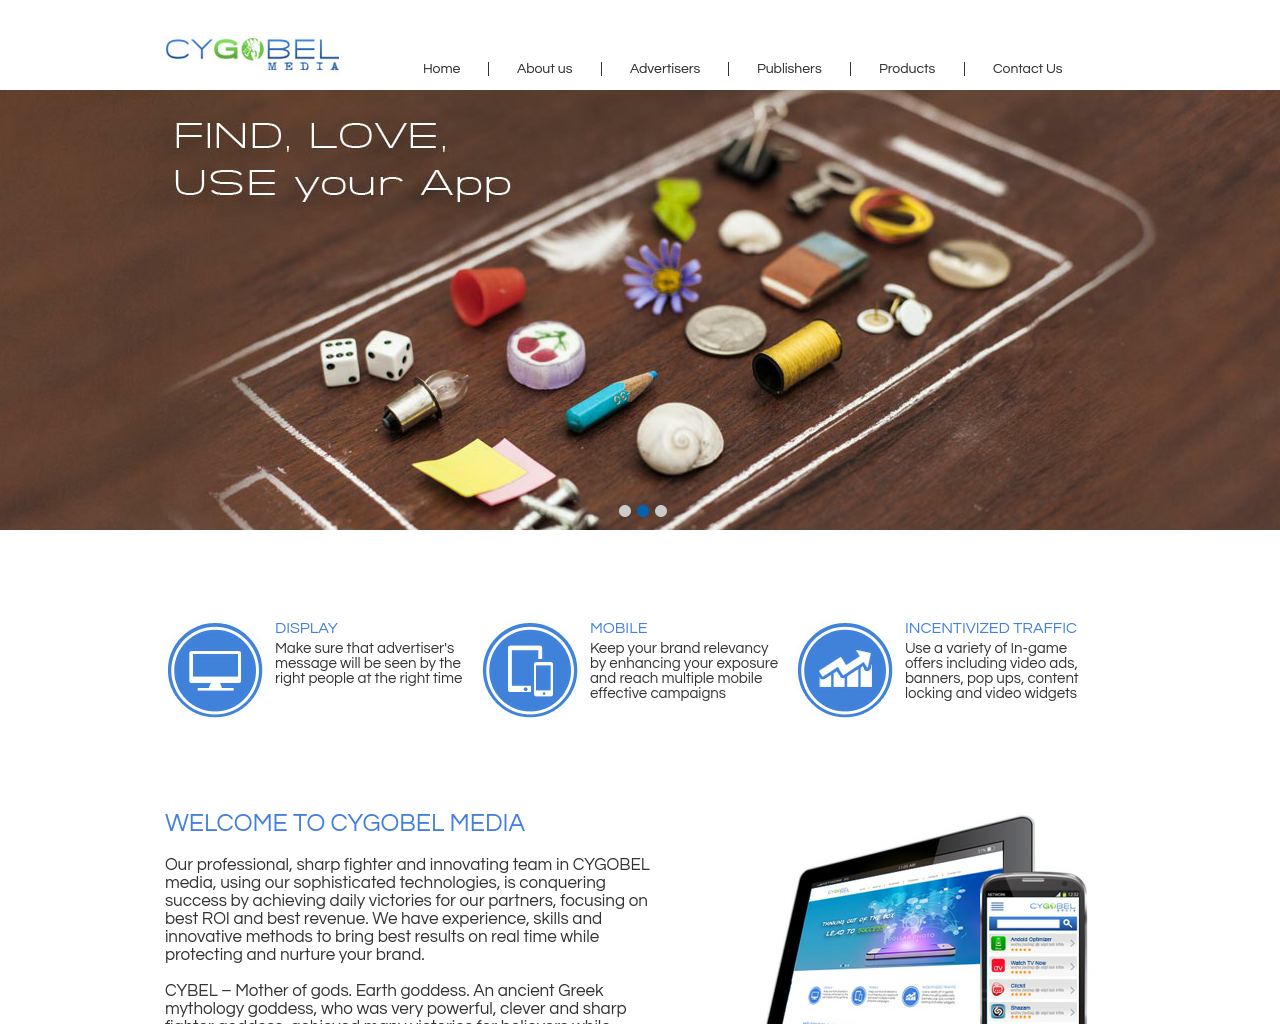 Cygobel-Media-Advertising-Reviews-Pricing